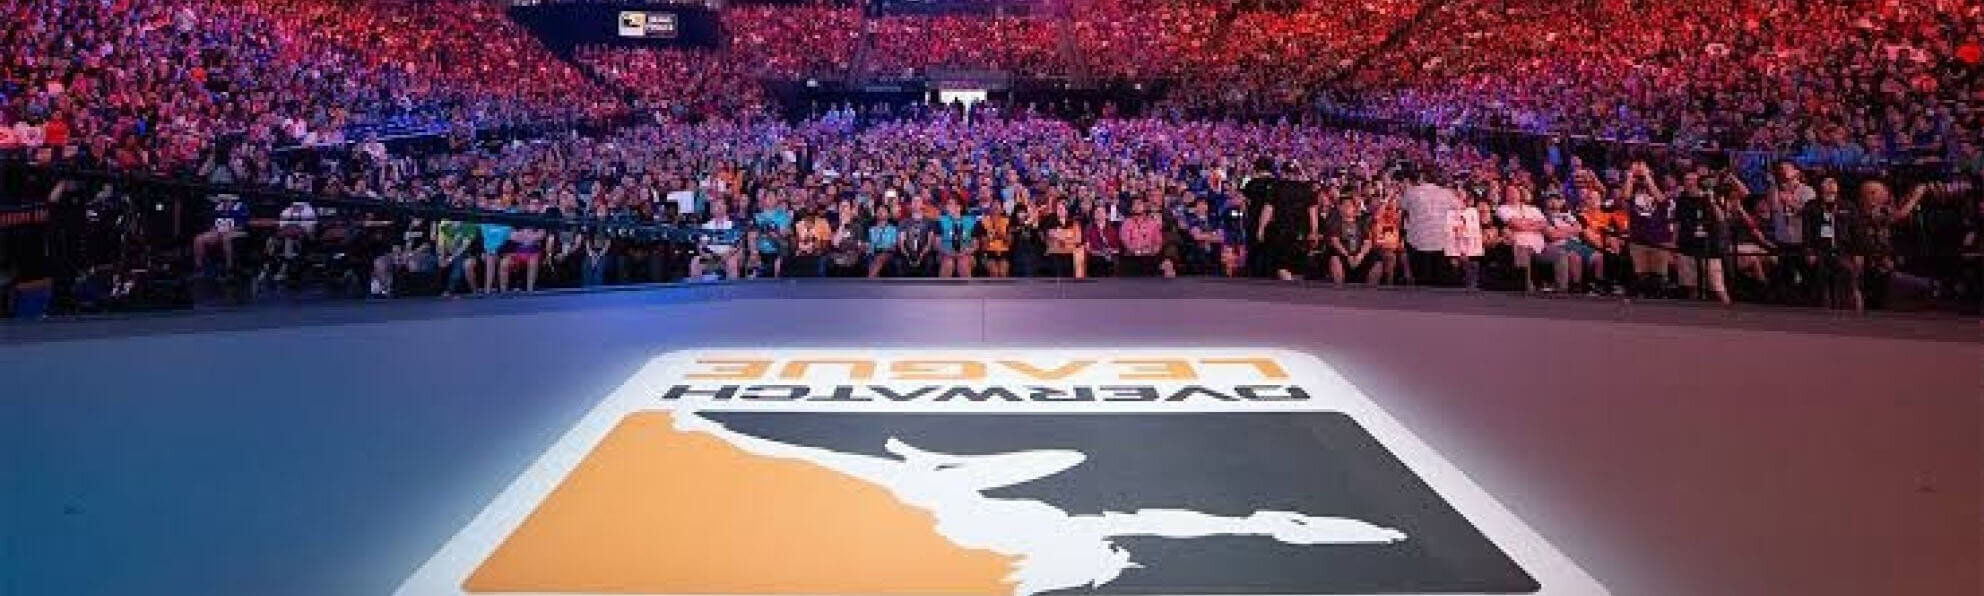 eSport Betting: Overwatch League April 17 2020 Matches Odds